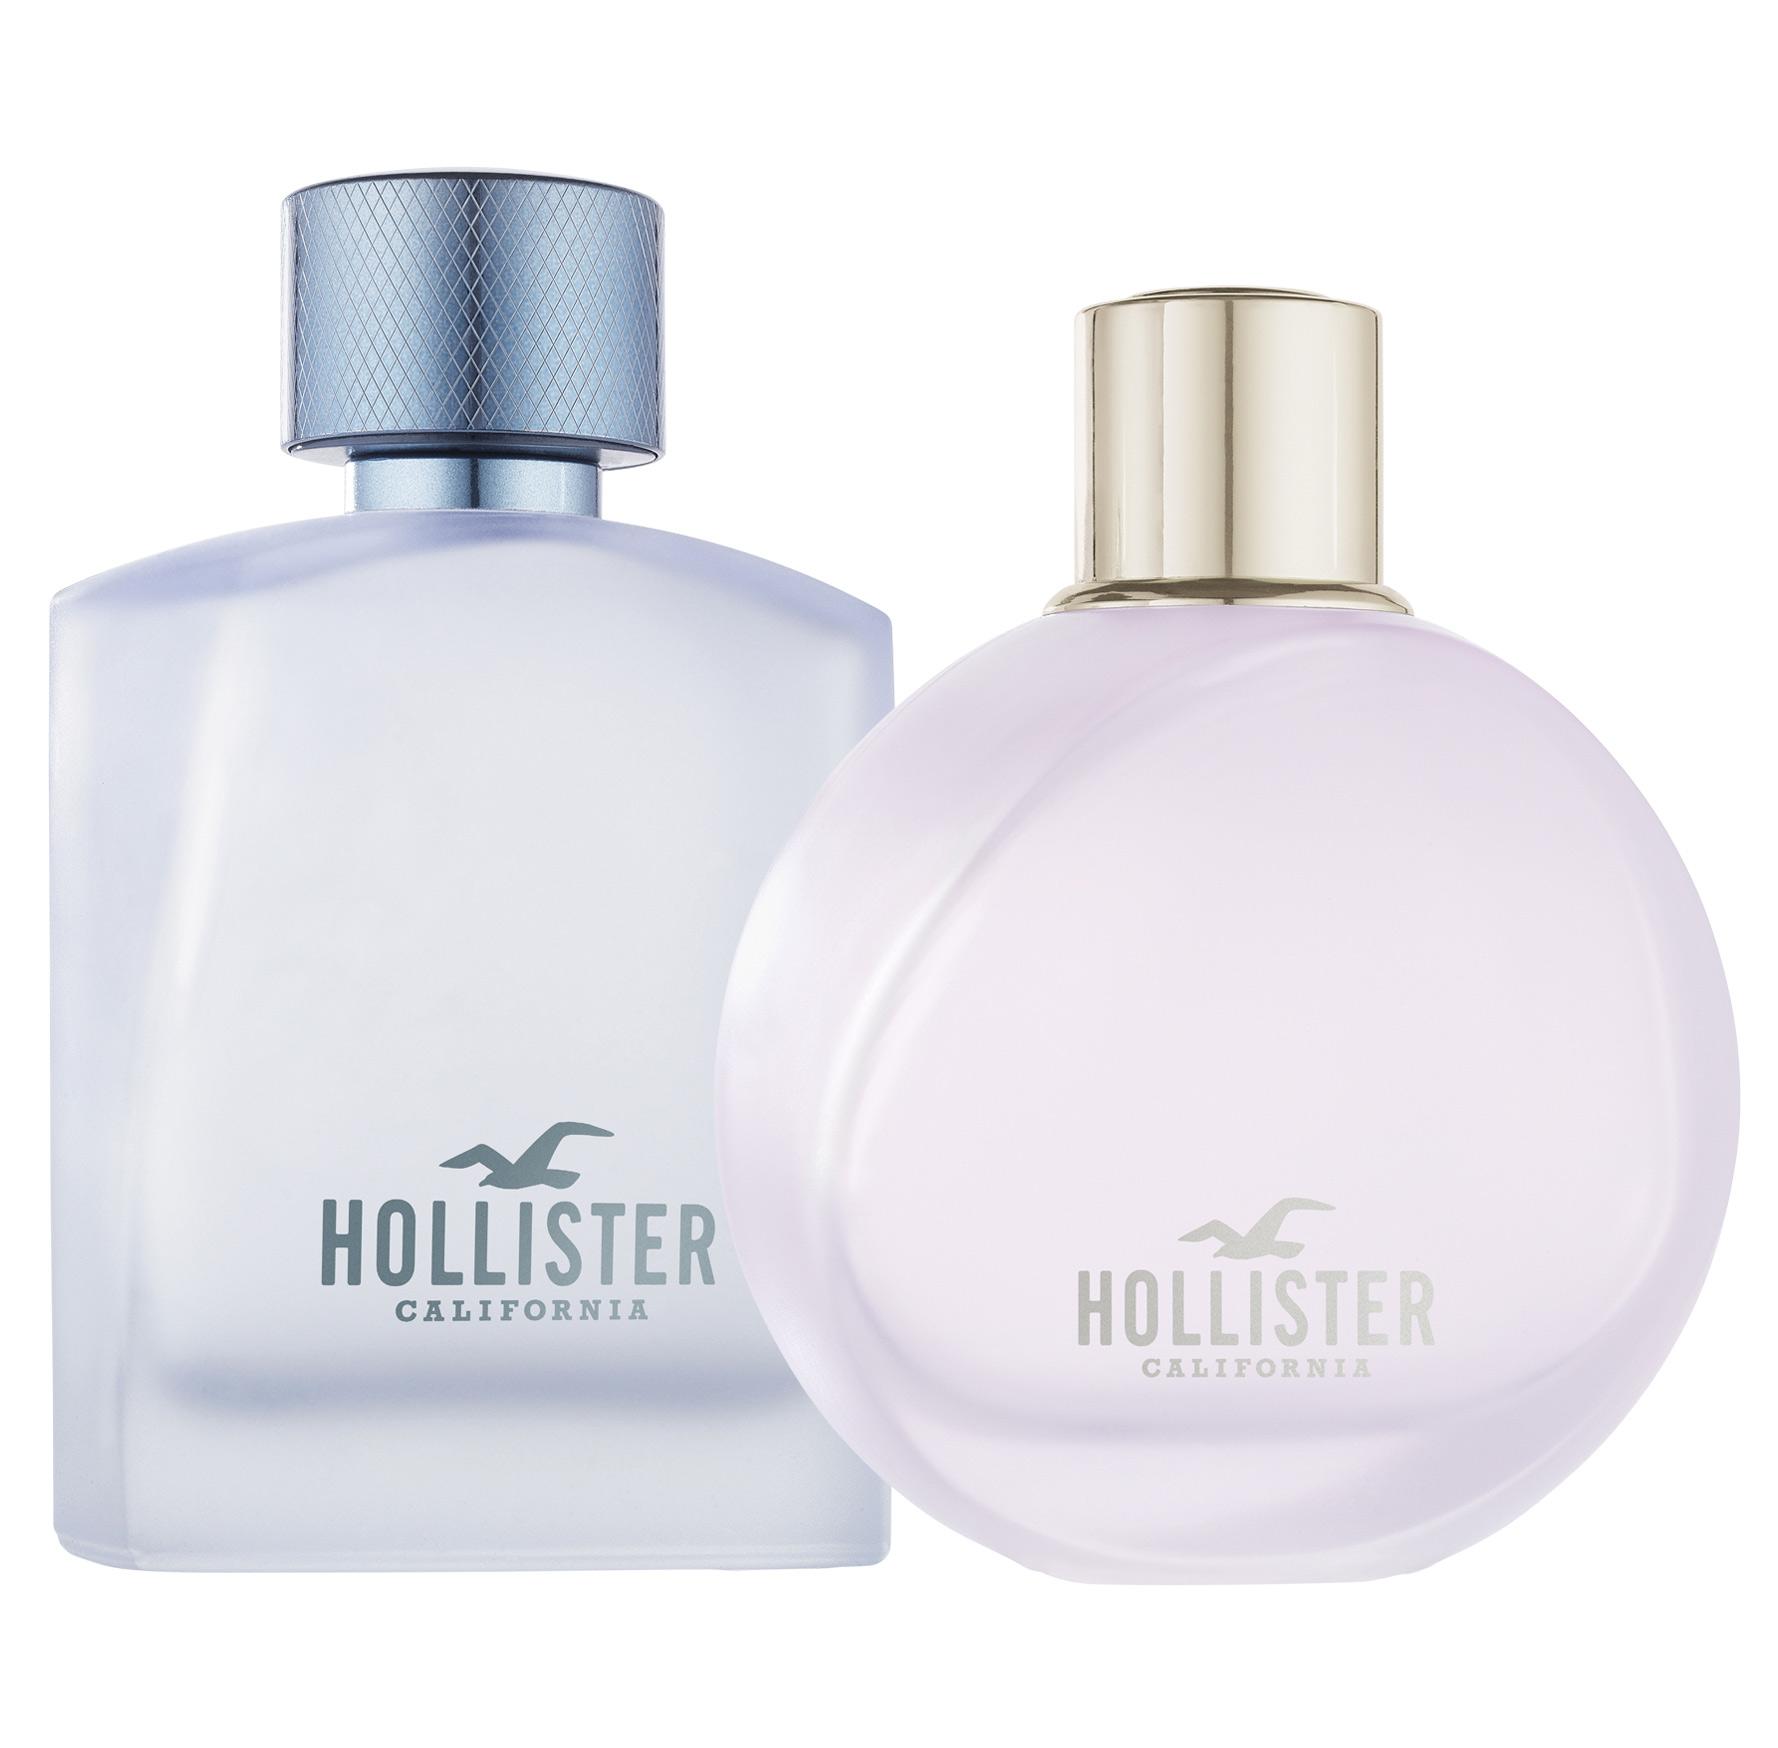 Nowe perfumy Free Wave Hollister!